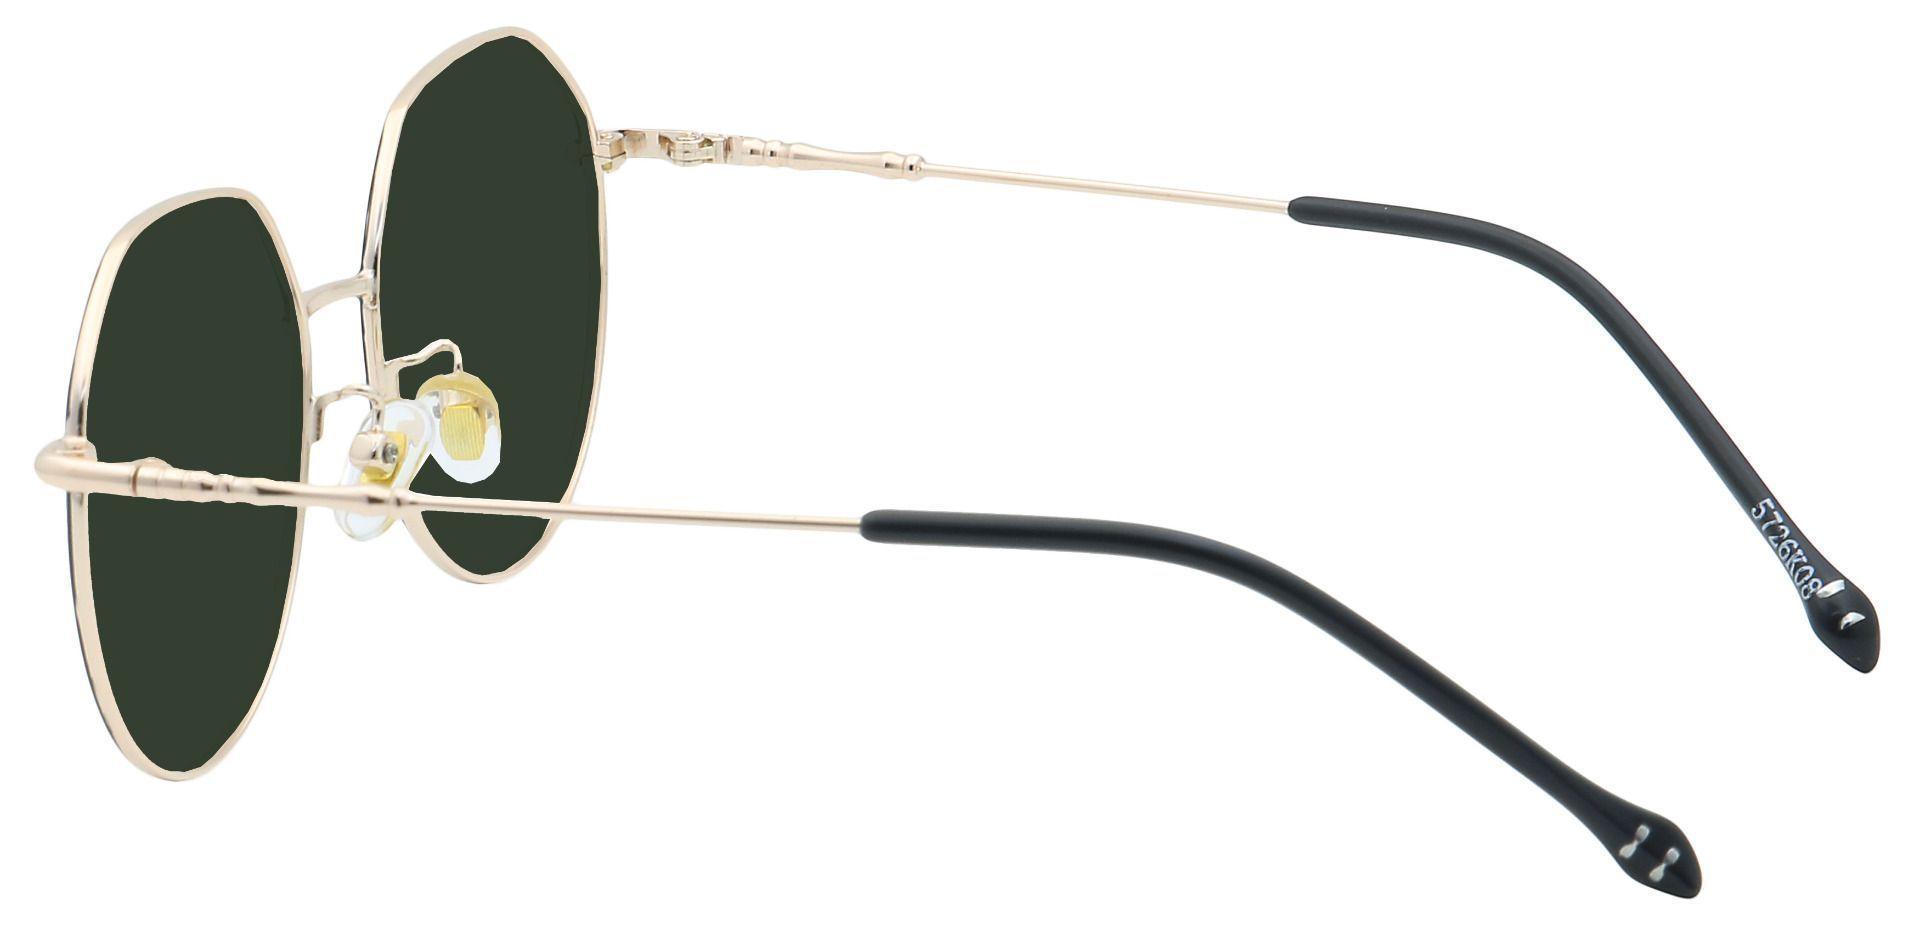 Wesley Round Prescription Sunglasses - Black Frame With Green Lenses